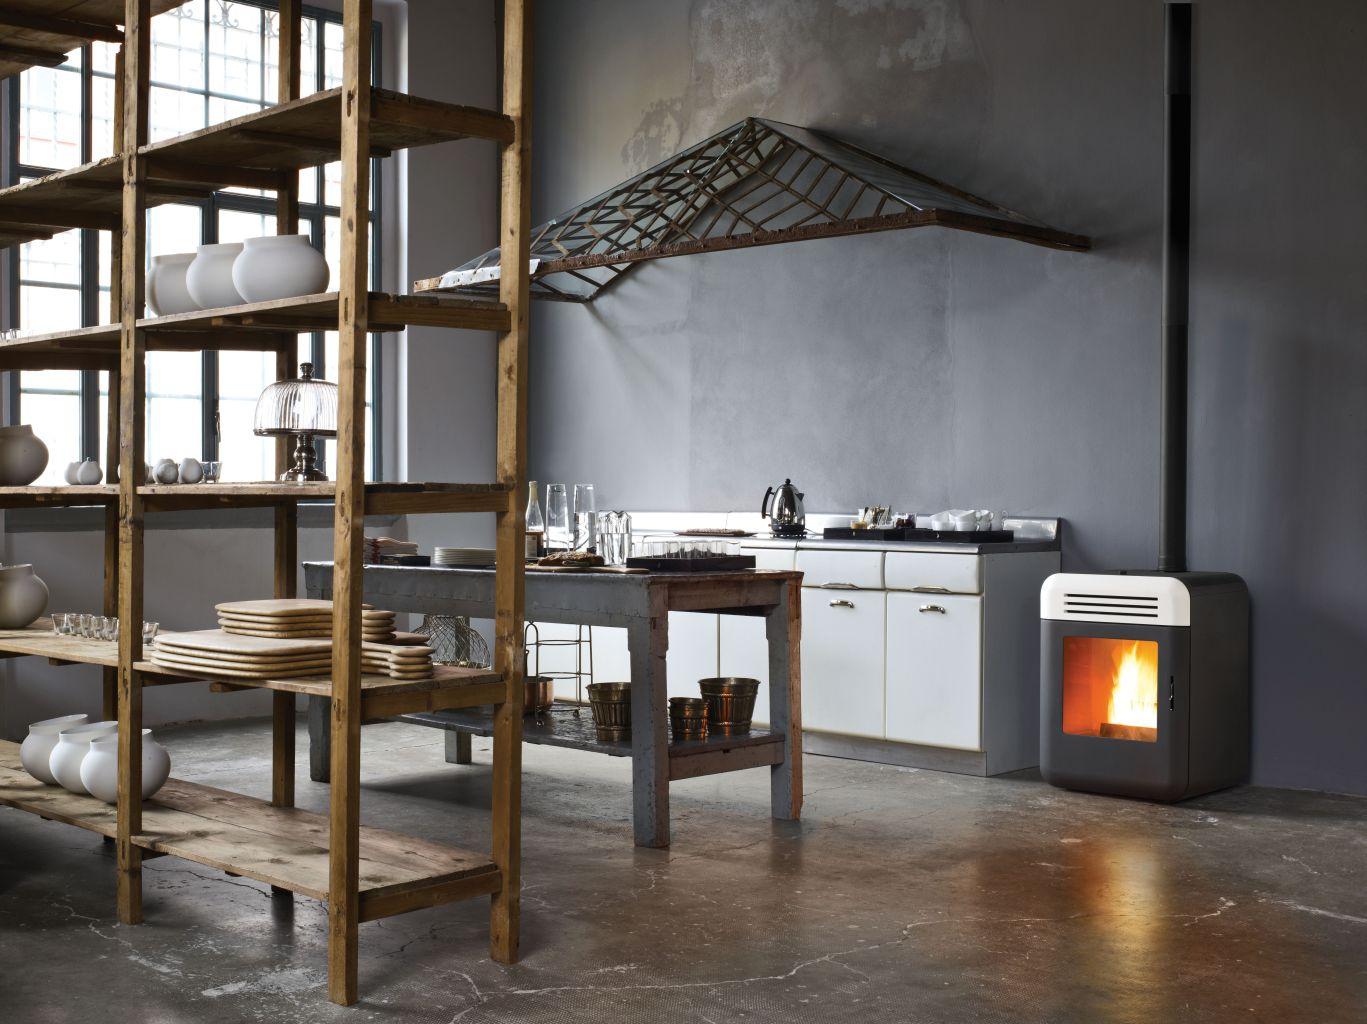 pellets fen pelletkaminofen von kaminbau weber erbach bei ulm. Black Bedroom Furniture Sets. Home Design Ideas